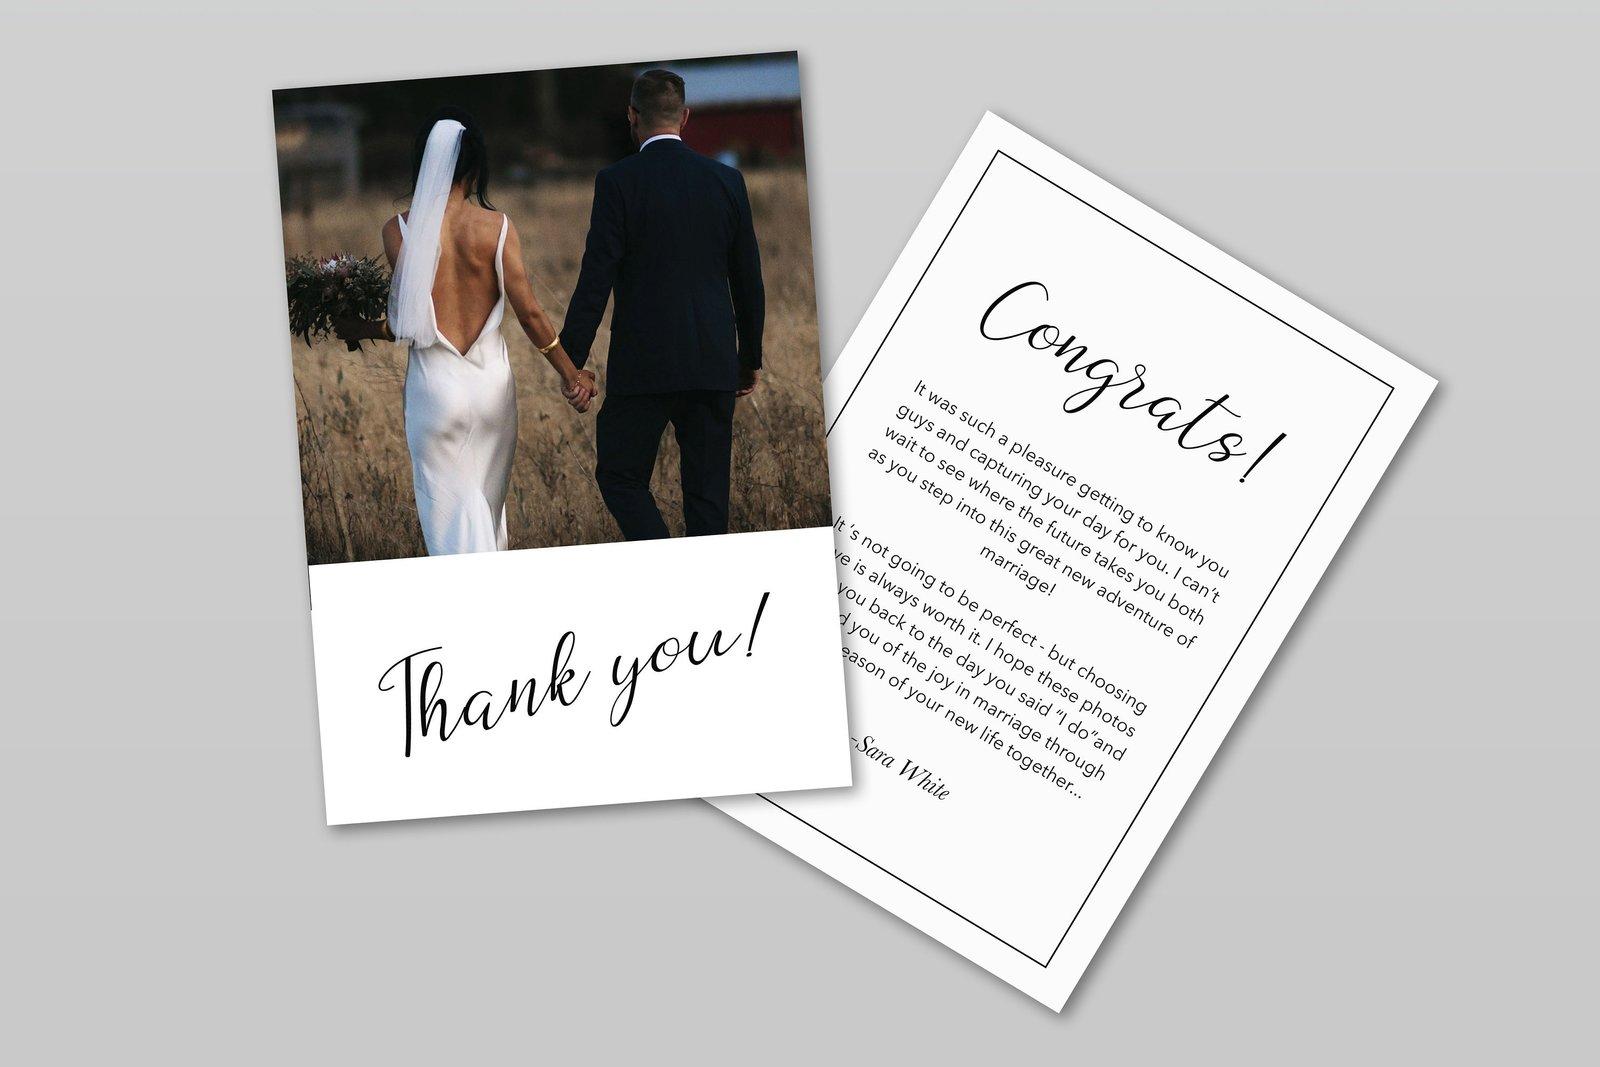 006 Stunning Thank You Card Template Wedding Image  Free Printable PublisherFull